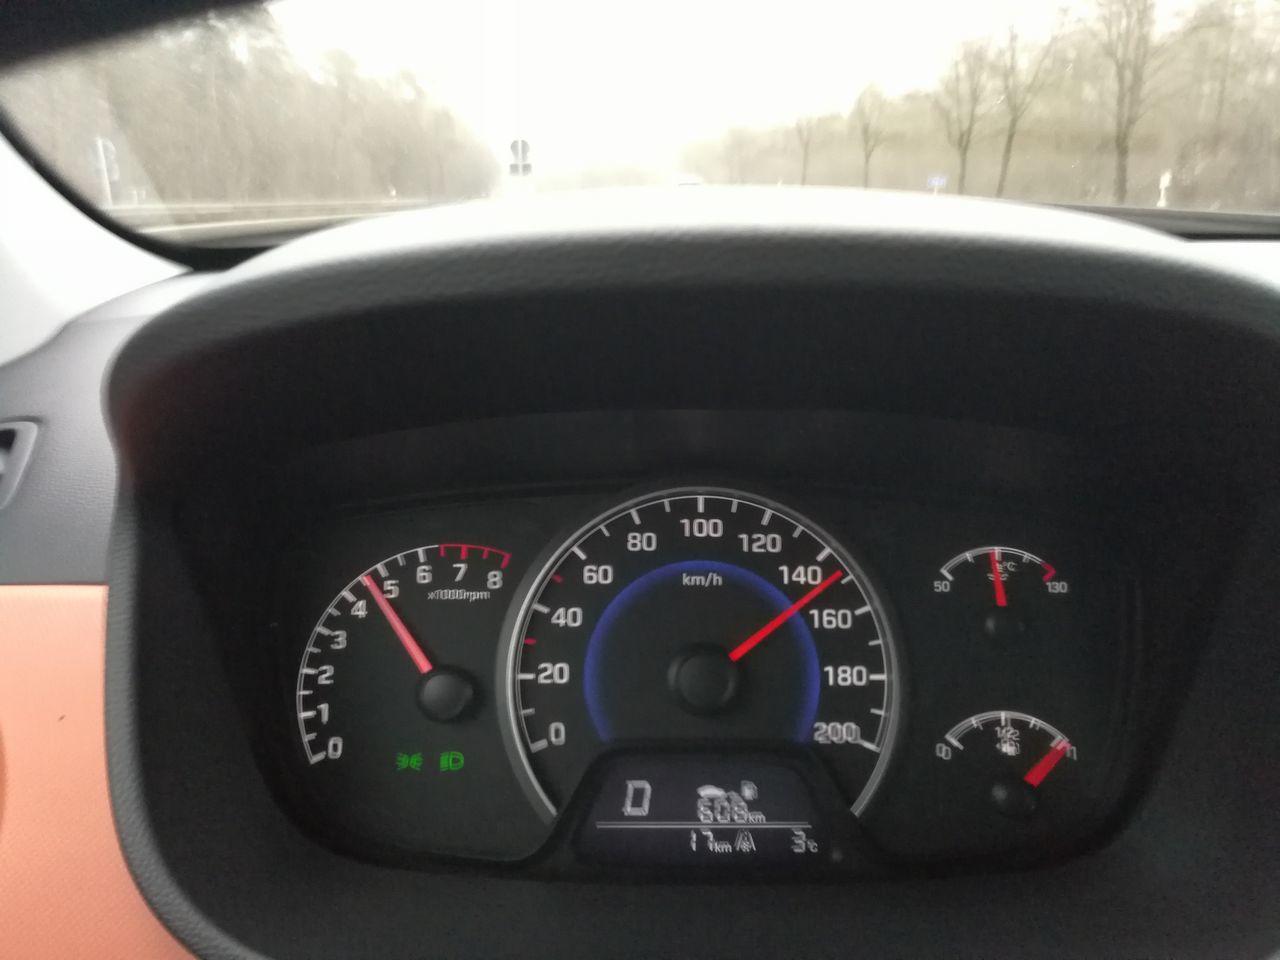 vehicle interior, car, car interior, dashboard, transportation, land vehicle, speedometer, mode of transport, gauge, steering wheel, no people, close-up, day, red